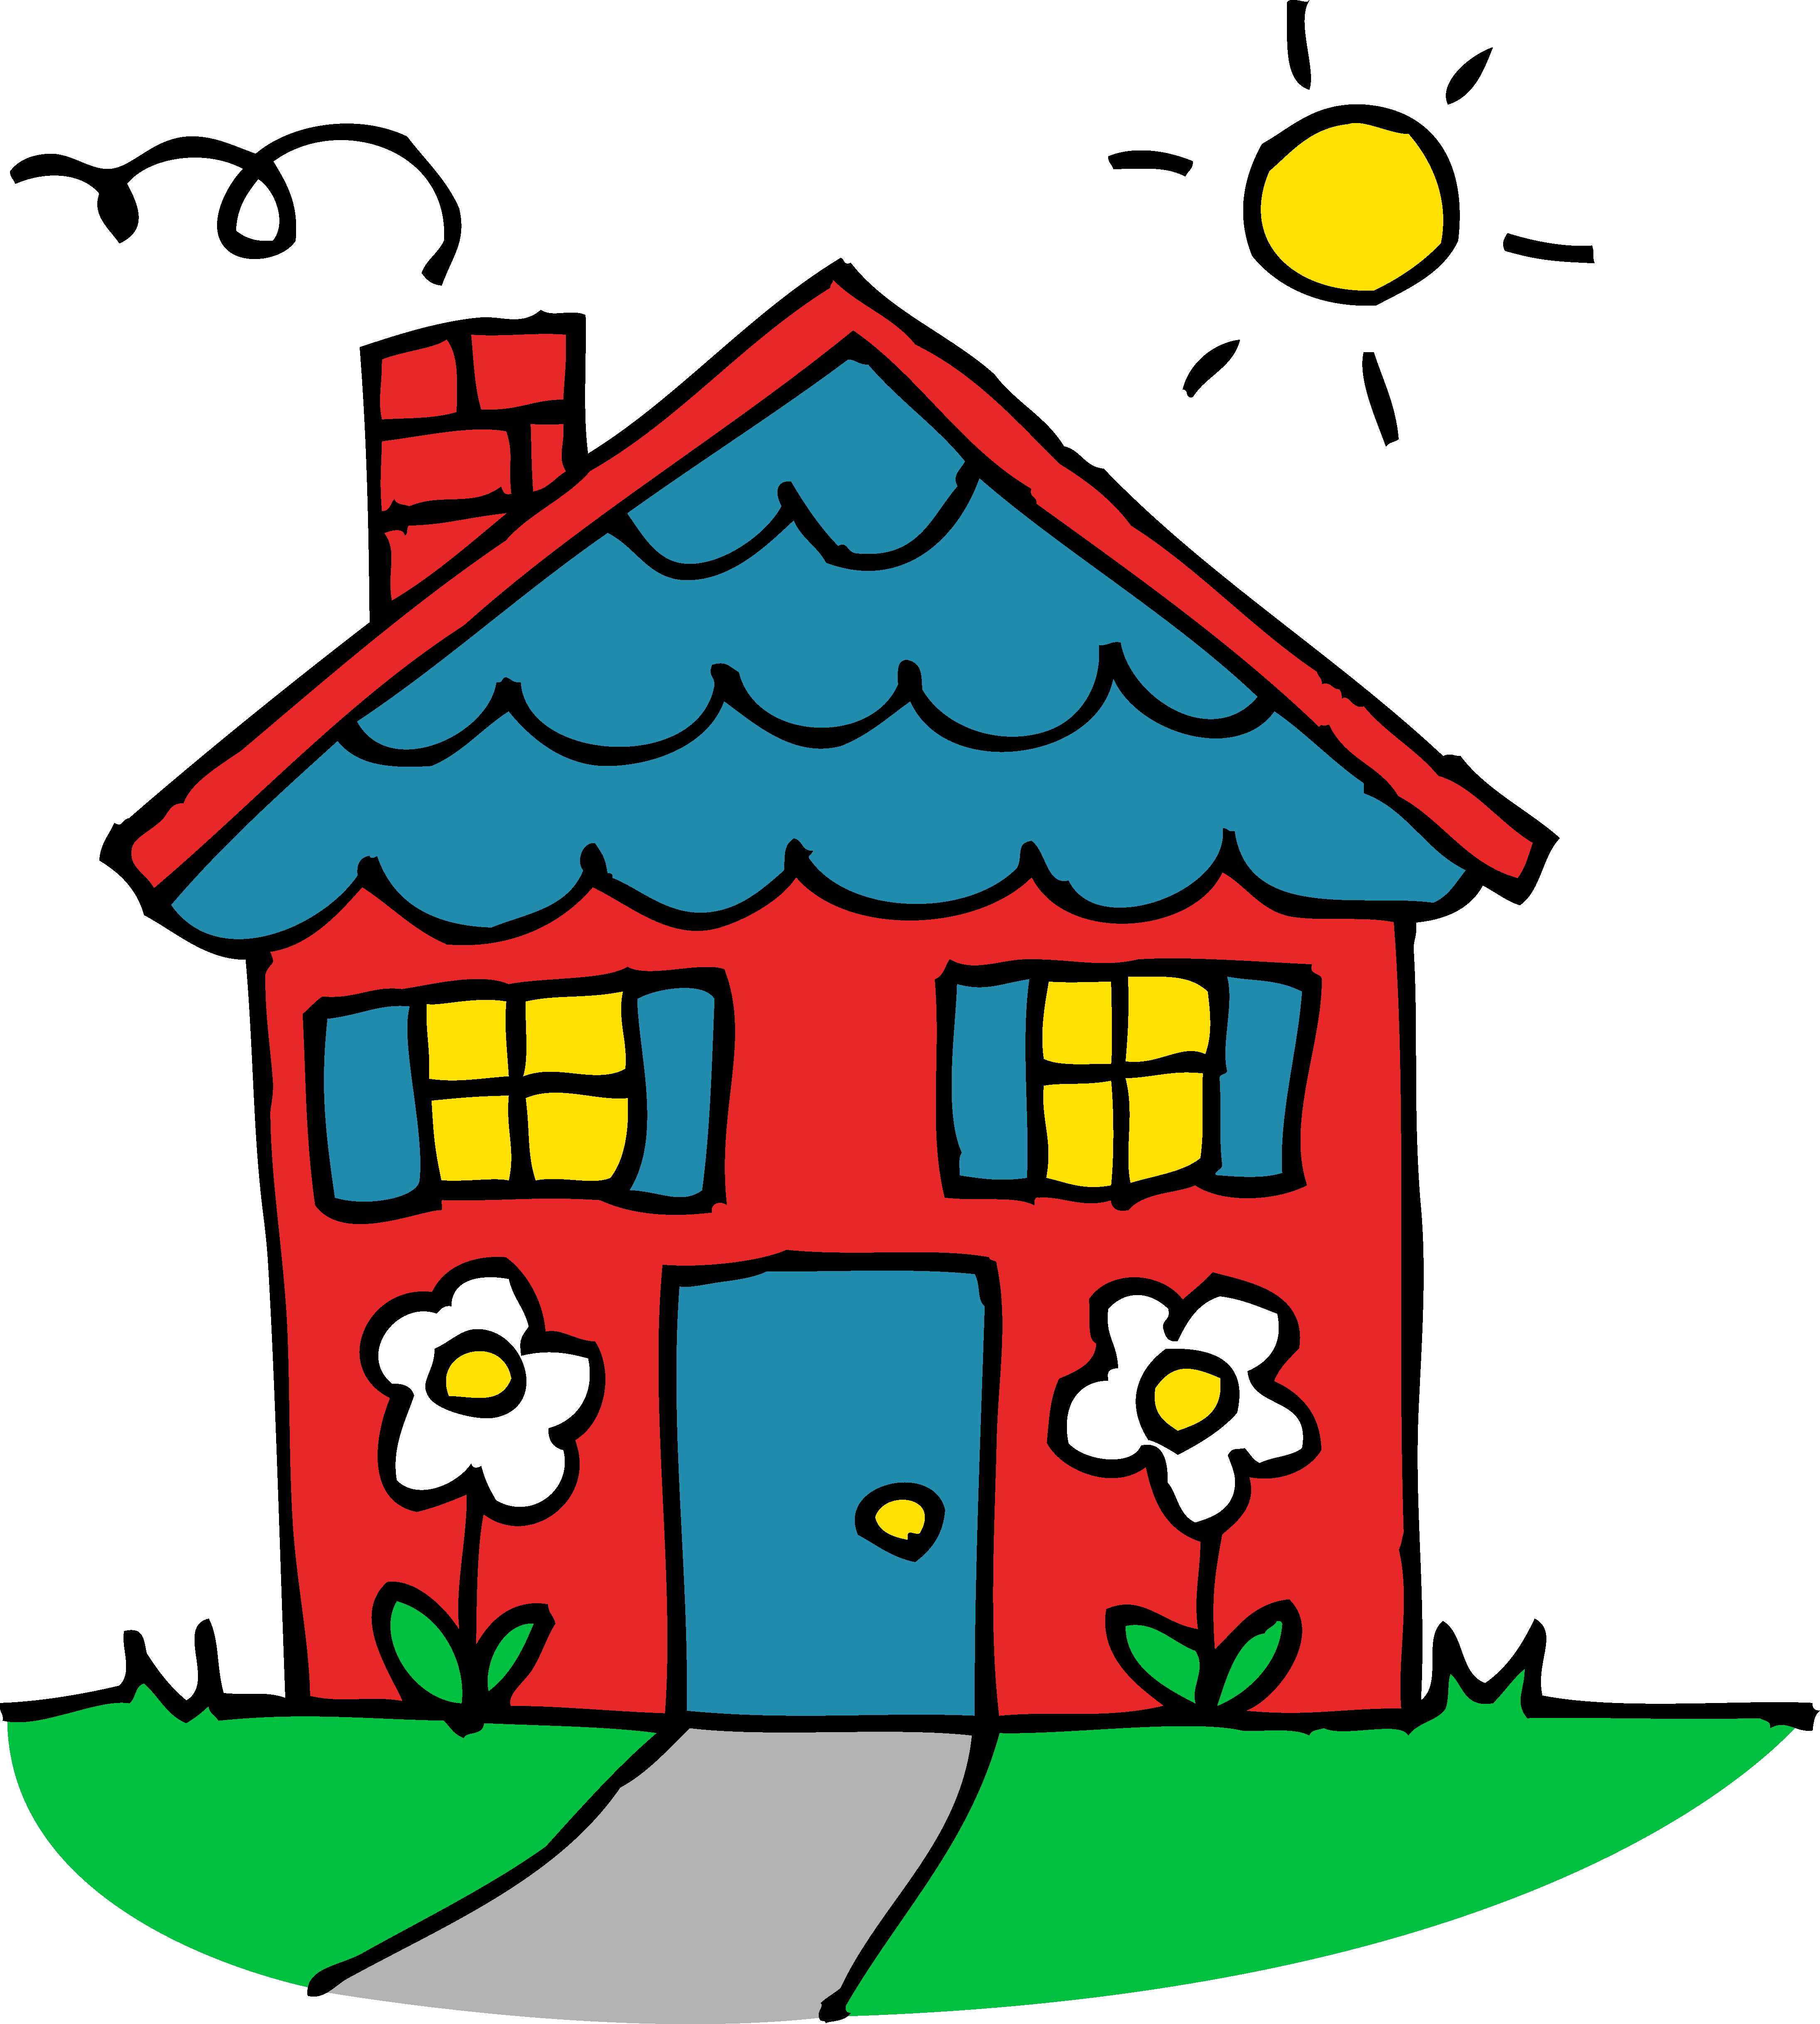 house clipart u0026middot; house clipart